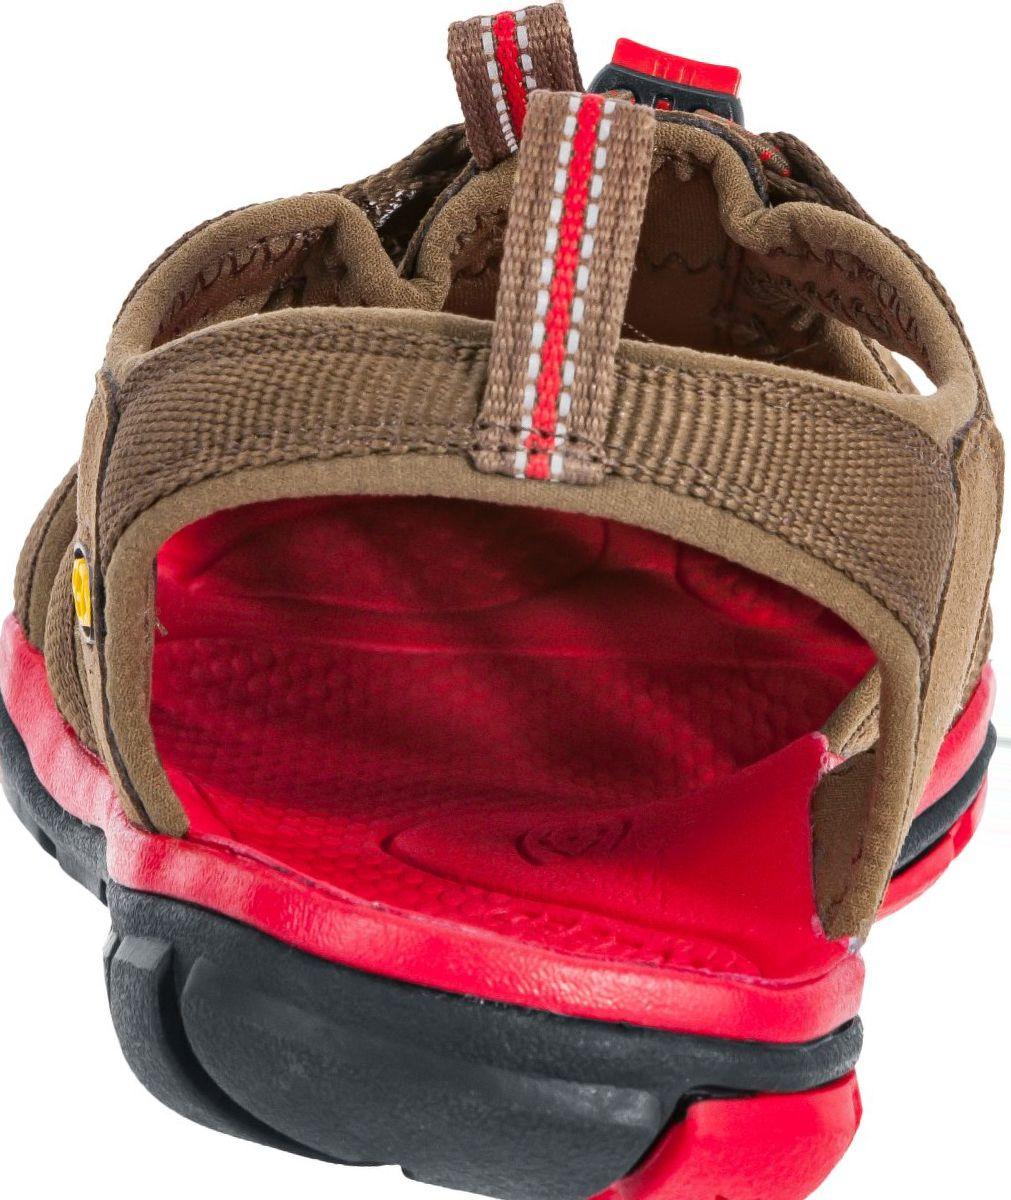 Keen™ Men's Clearwater CNX Sandals